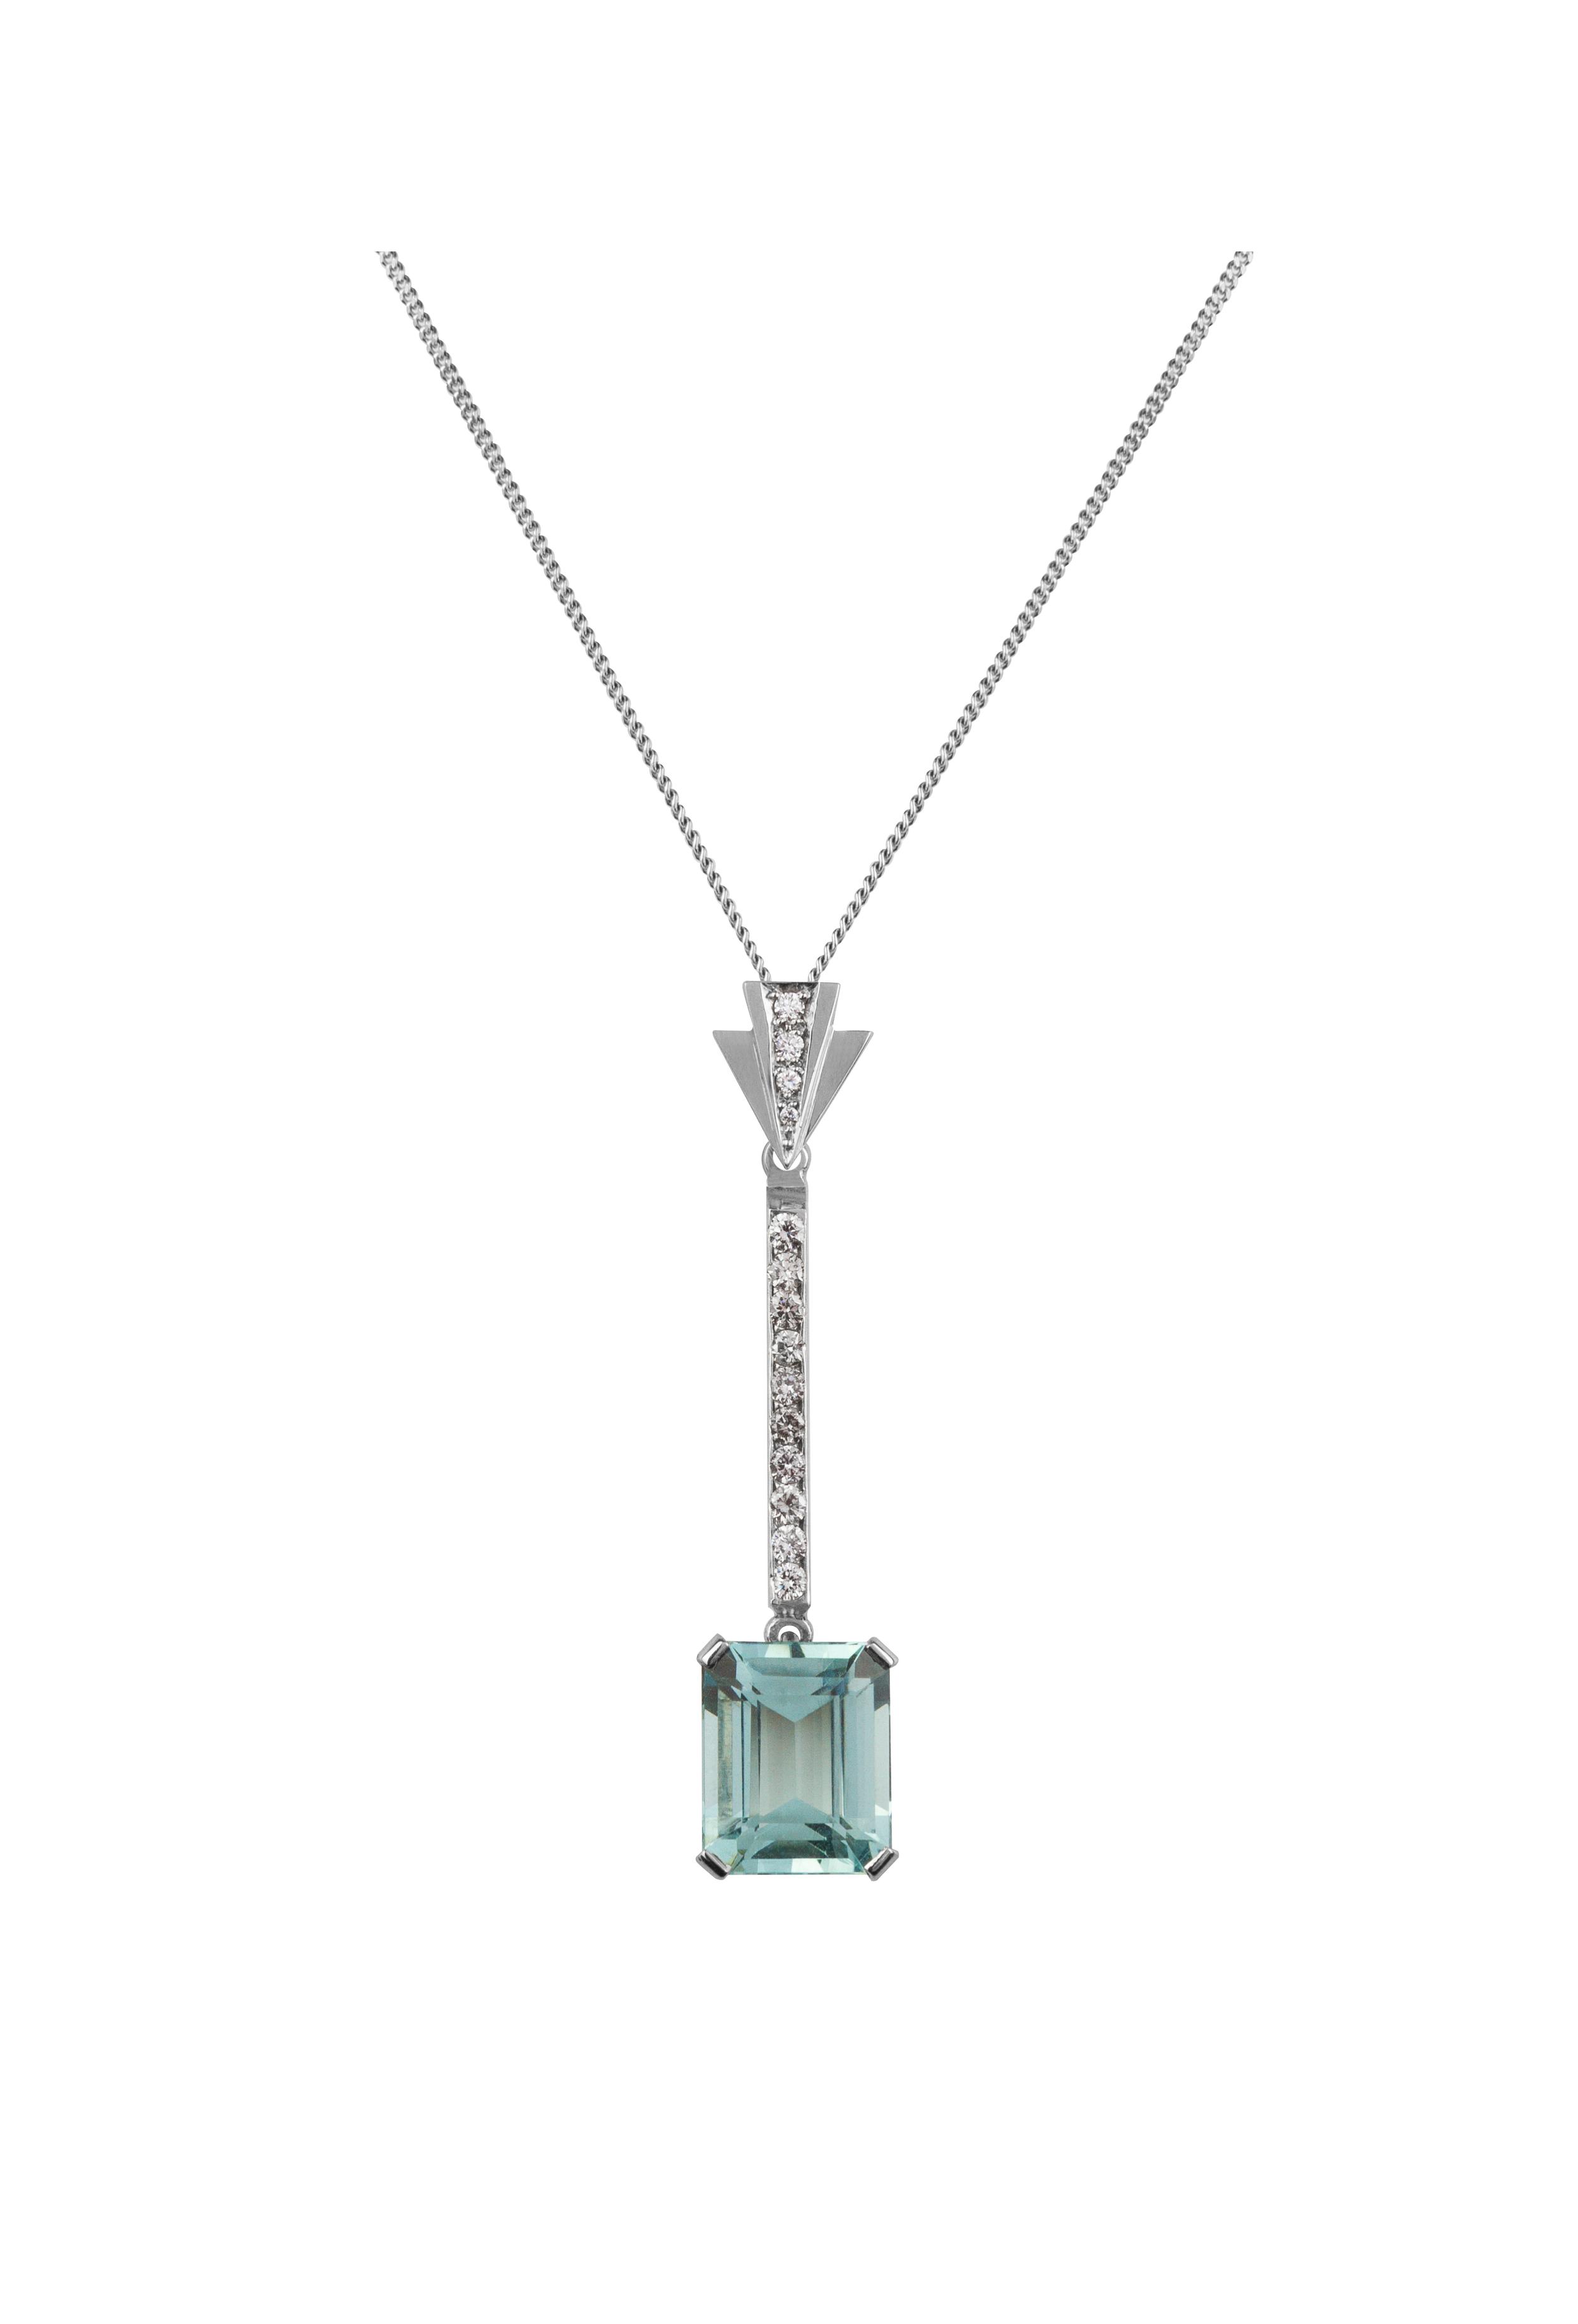 White Gold, Aquamarine & Diamond  £2995